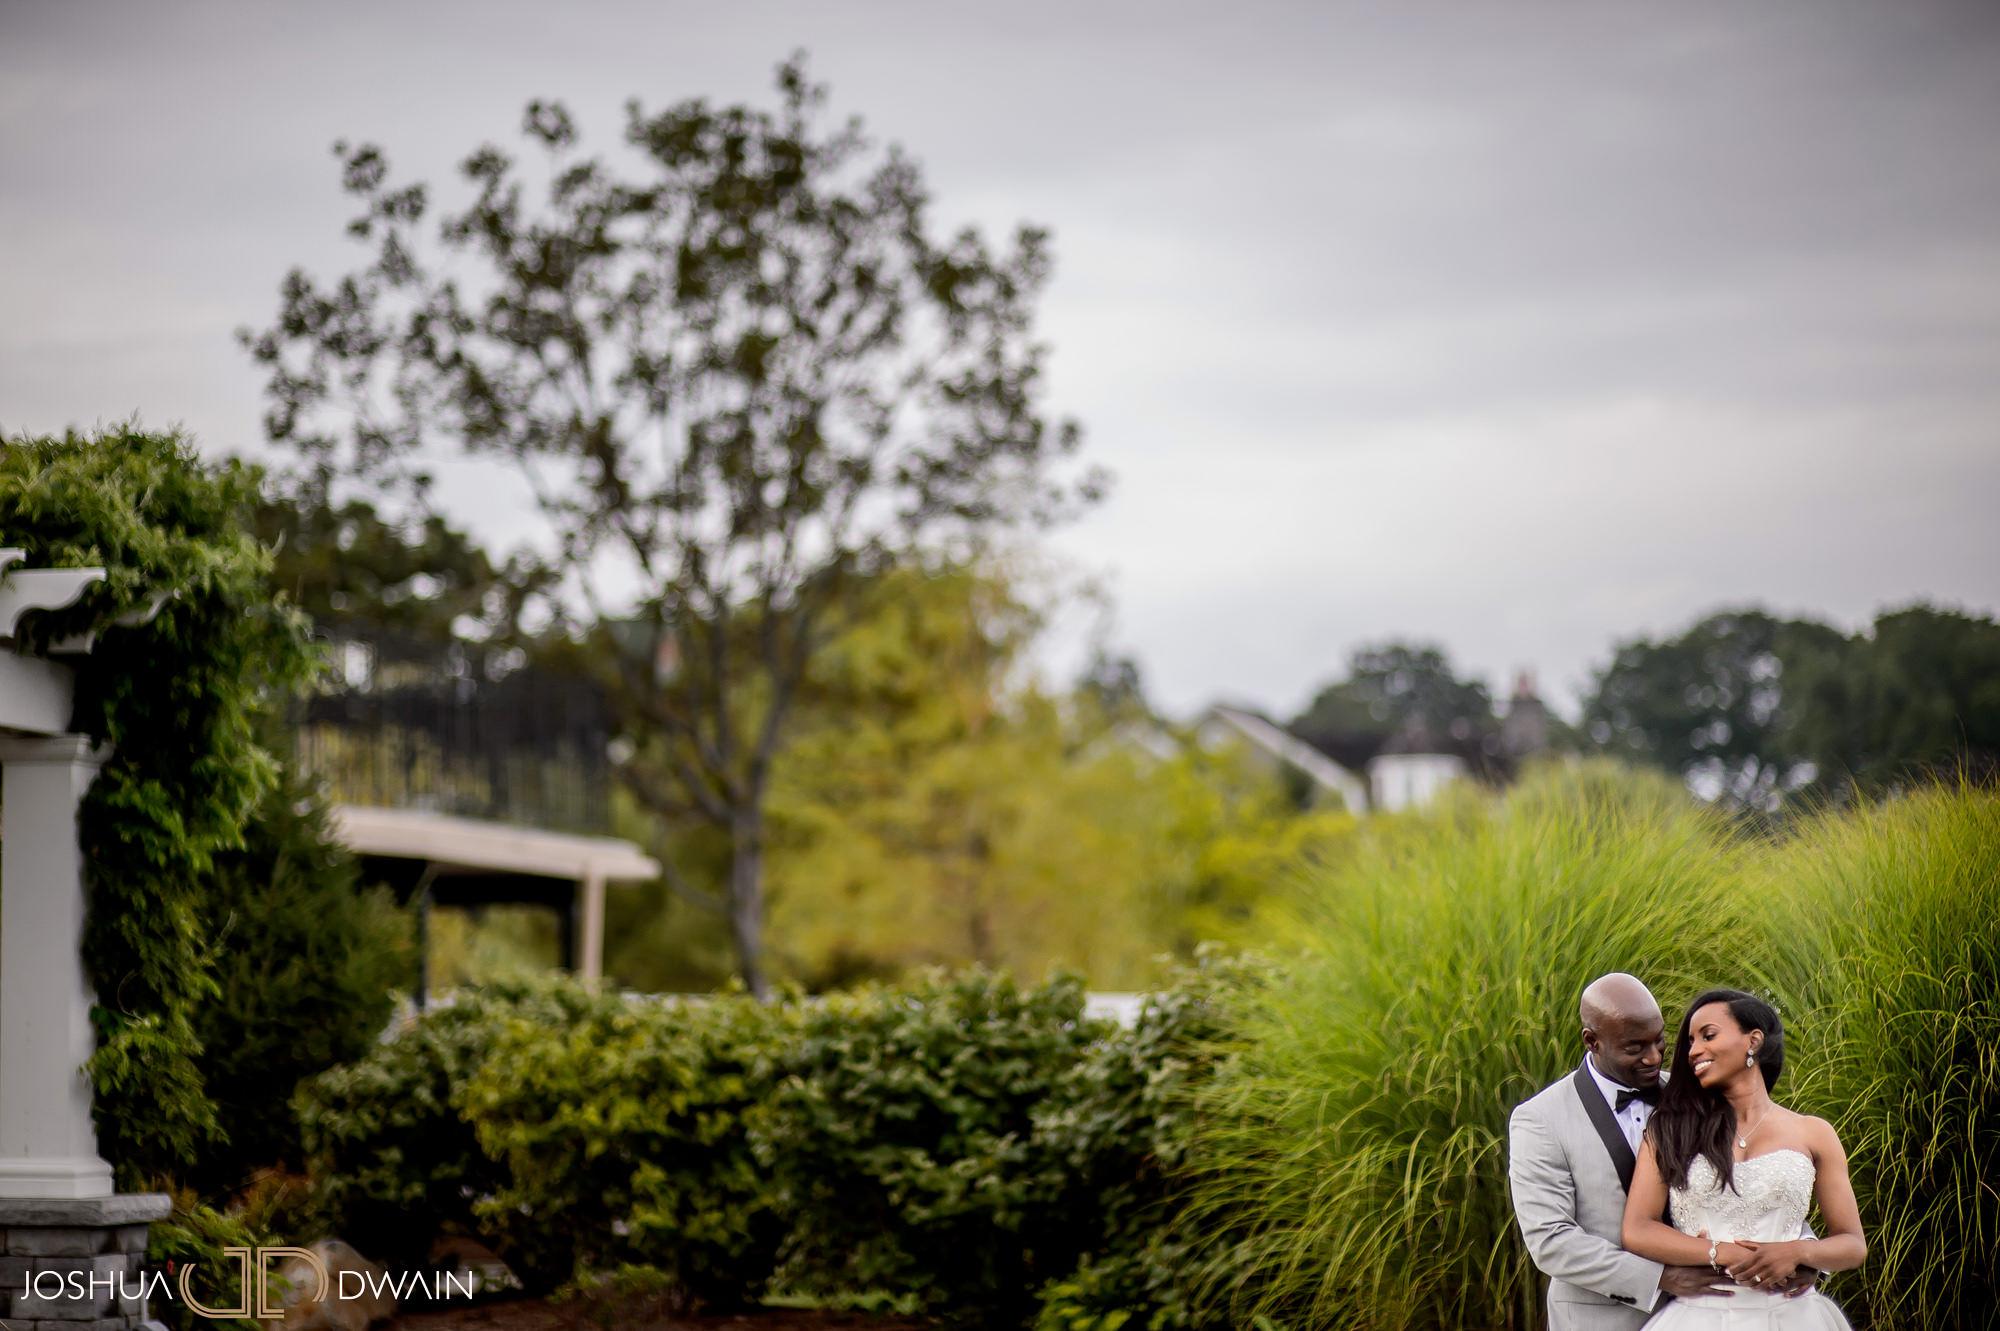 victorious-events-nyc-016-alana-vibert-greentree-country-club-wedding-joshua-dwain.jpg